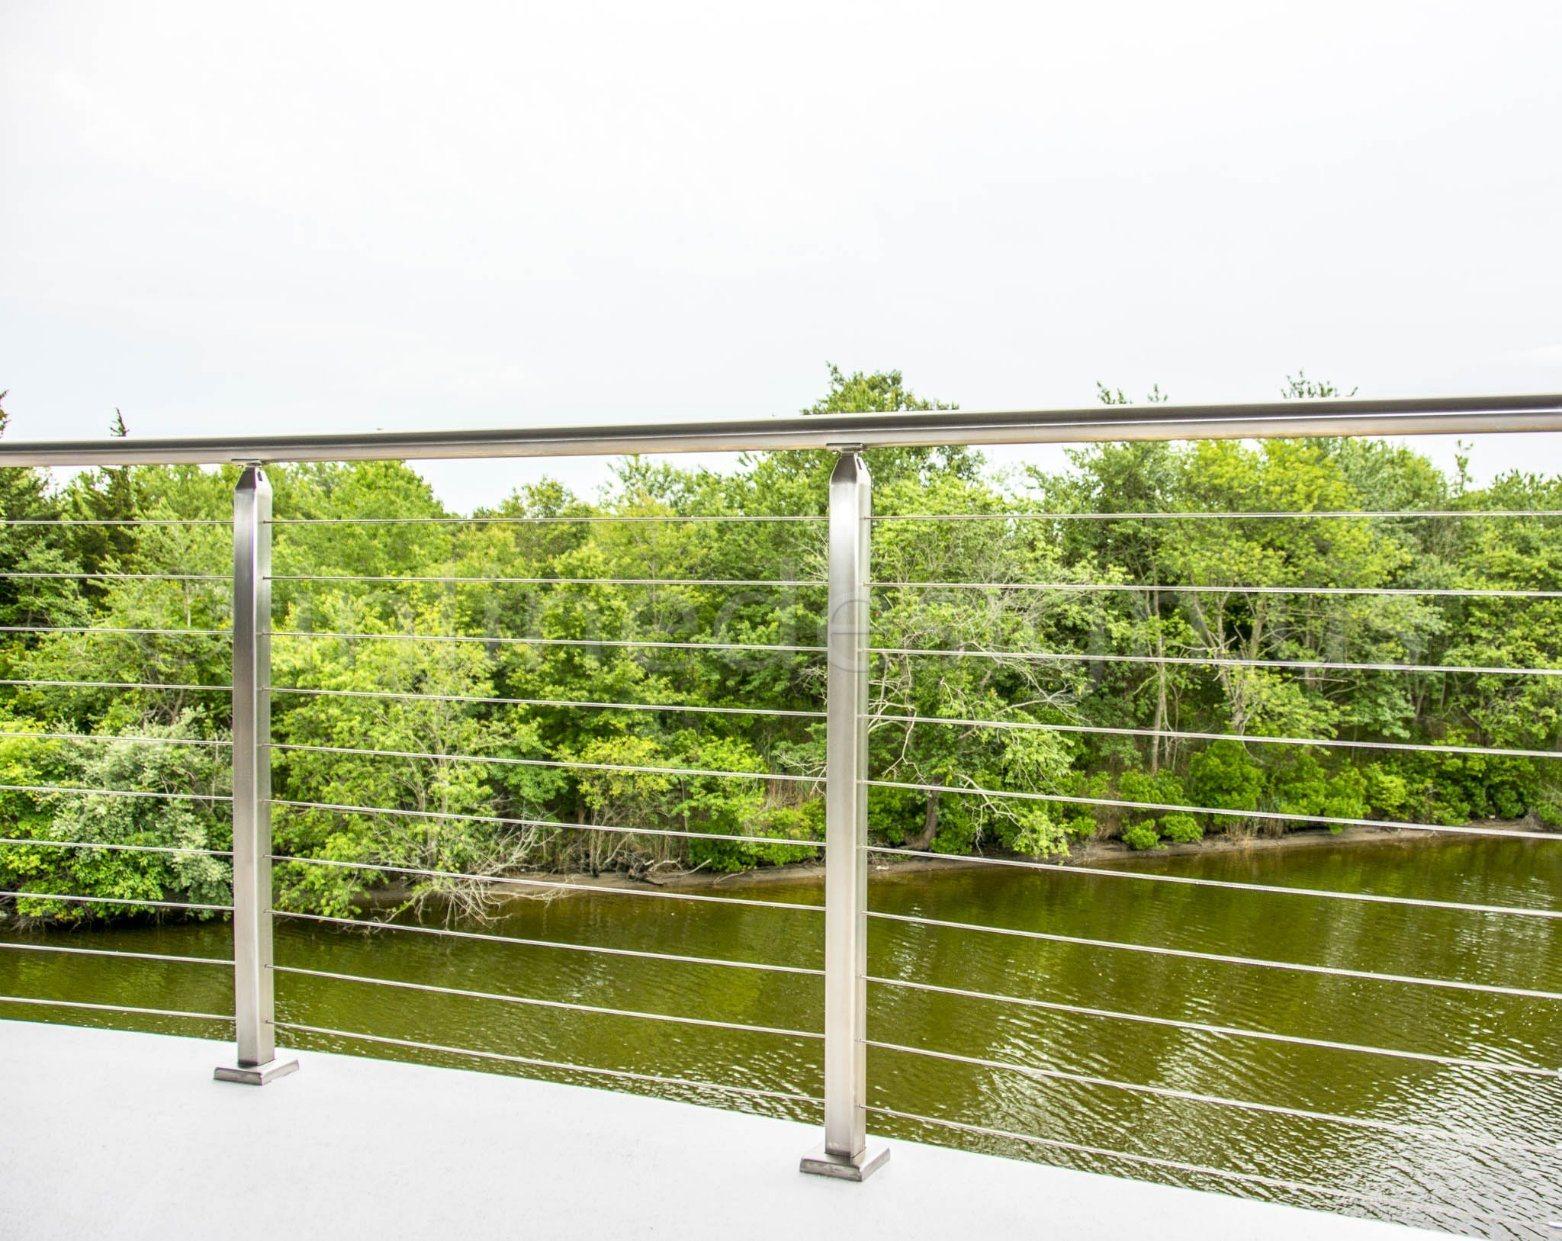 Stainless Steel Railing Balustrade/ Railing Stairs / Stainless Steel Wire Balustrade